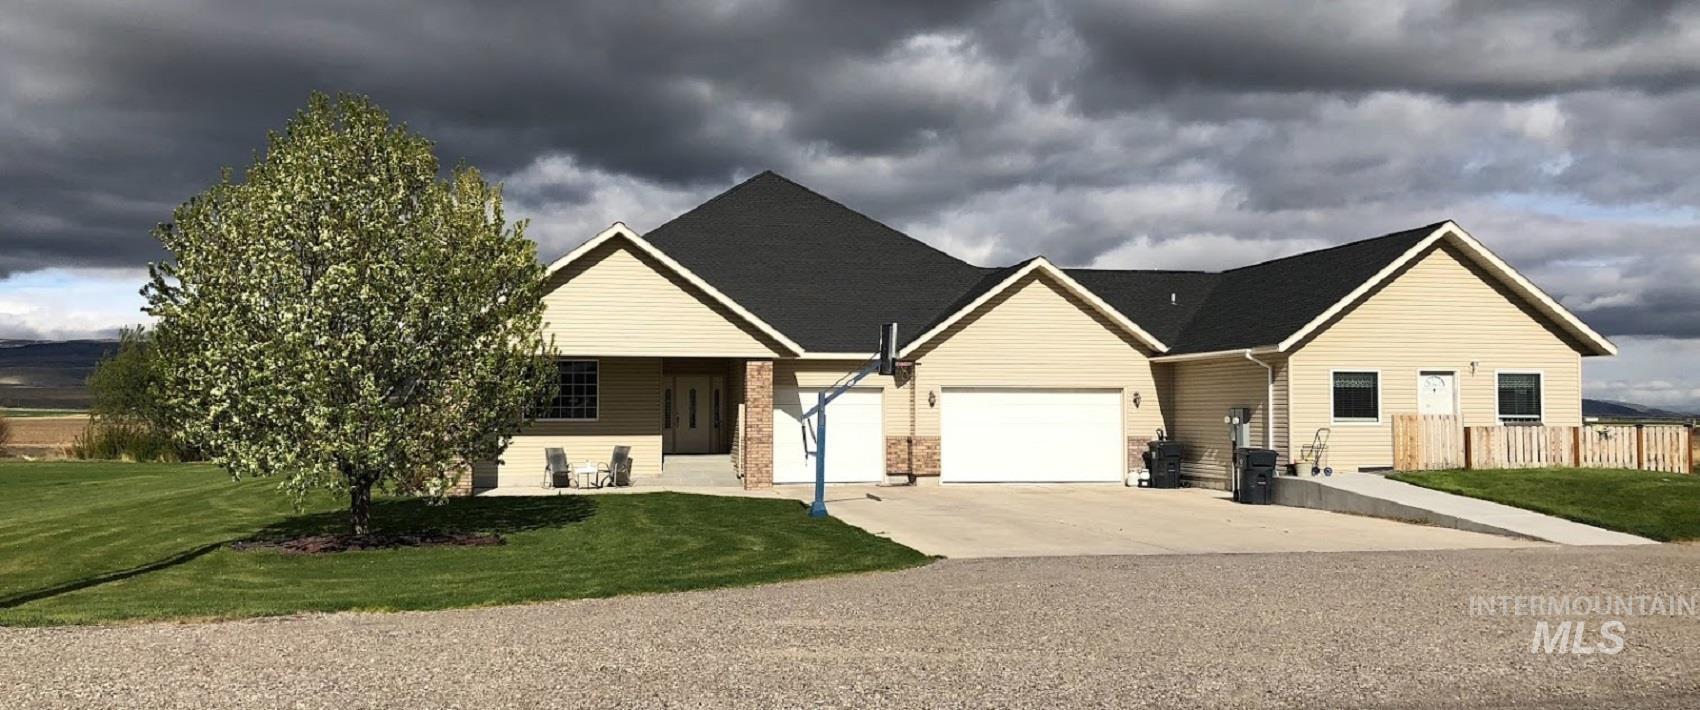 435 S College Property Photo 13